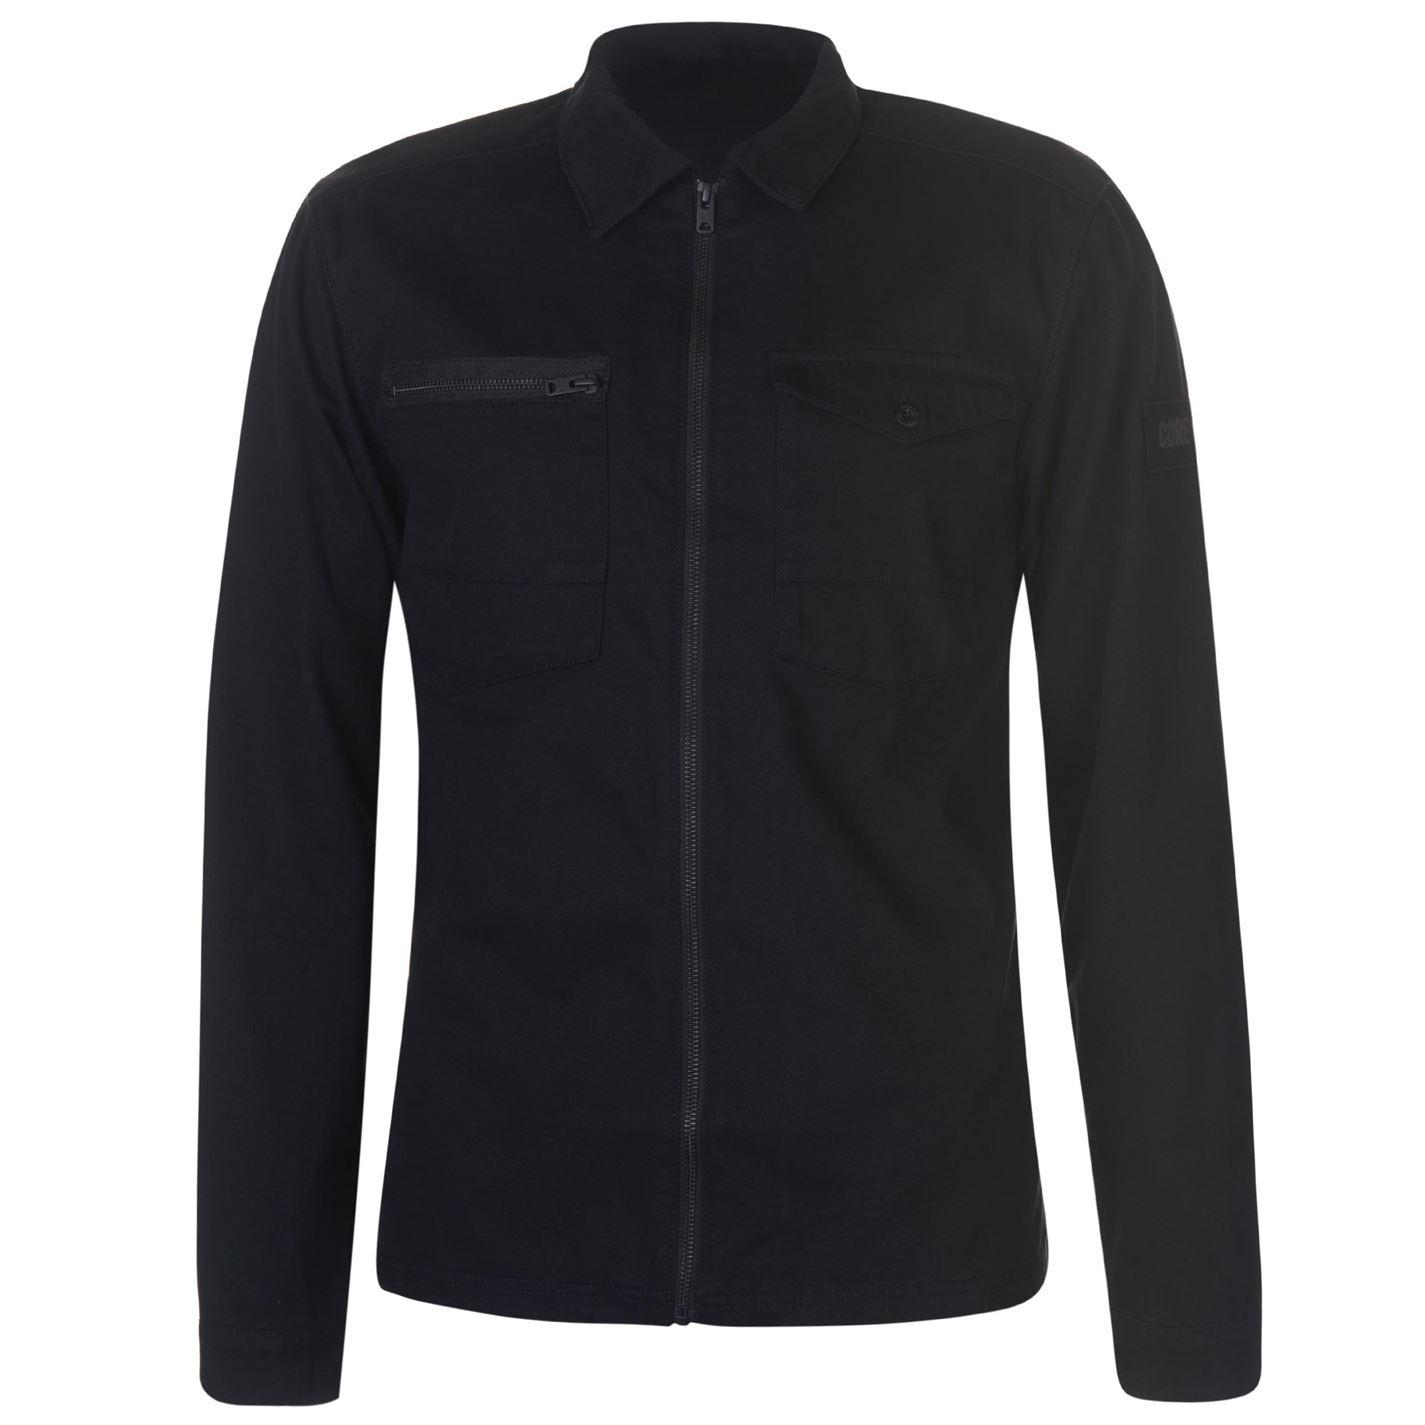 Jack and Jones Core Drake Long Sleeve Shirt